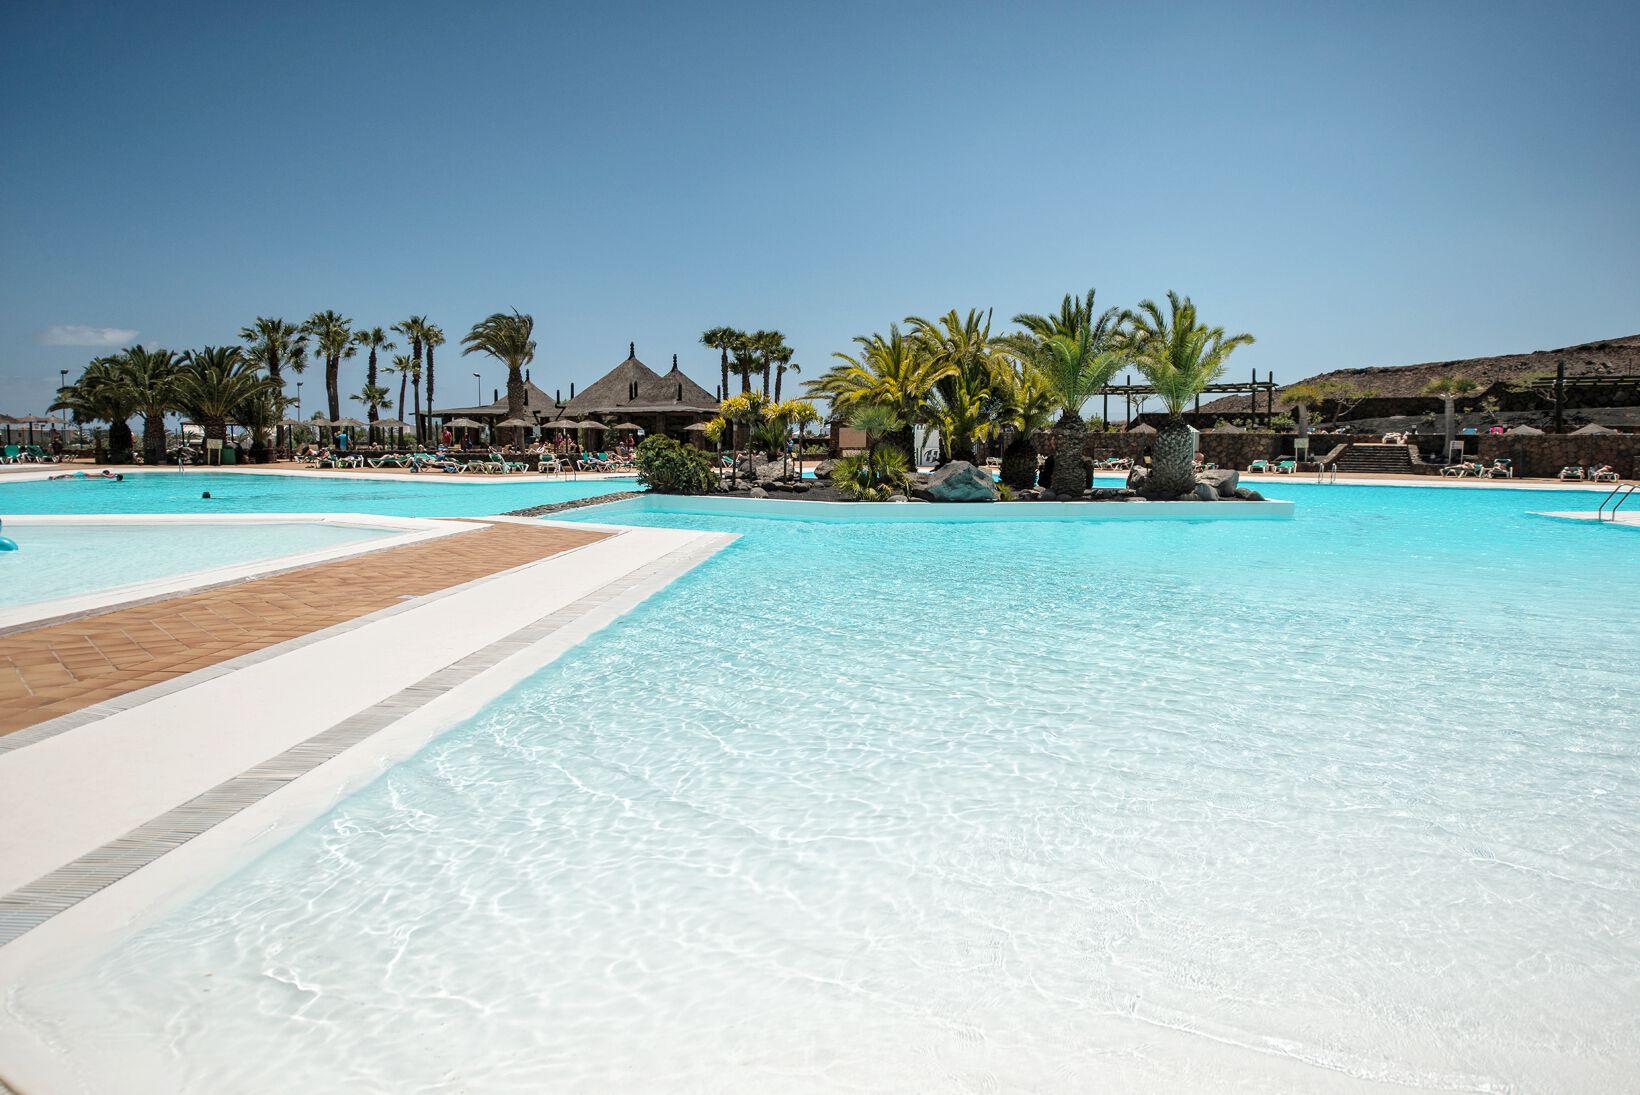 Séjour Lanzarote - Hotel Beatriz Costa Teguise Spa - 4*